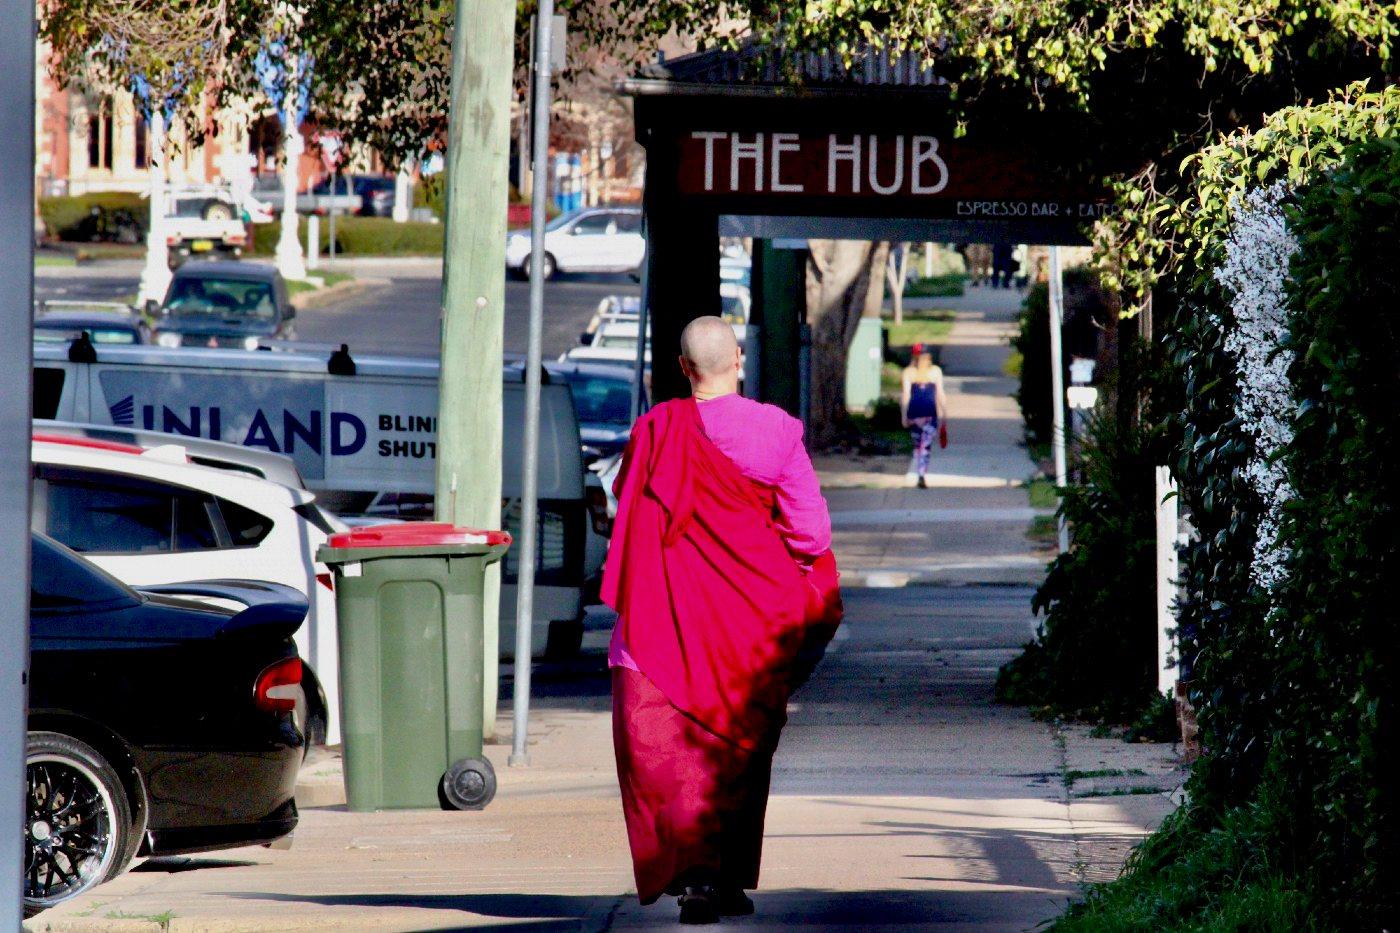 Food and Coffee Bathurst NSW The Hub